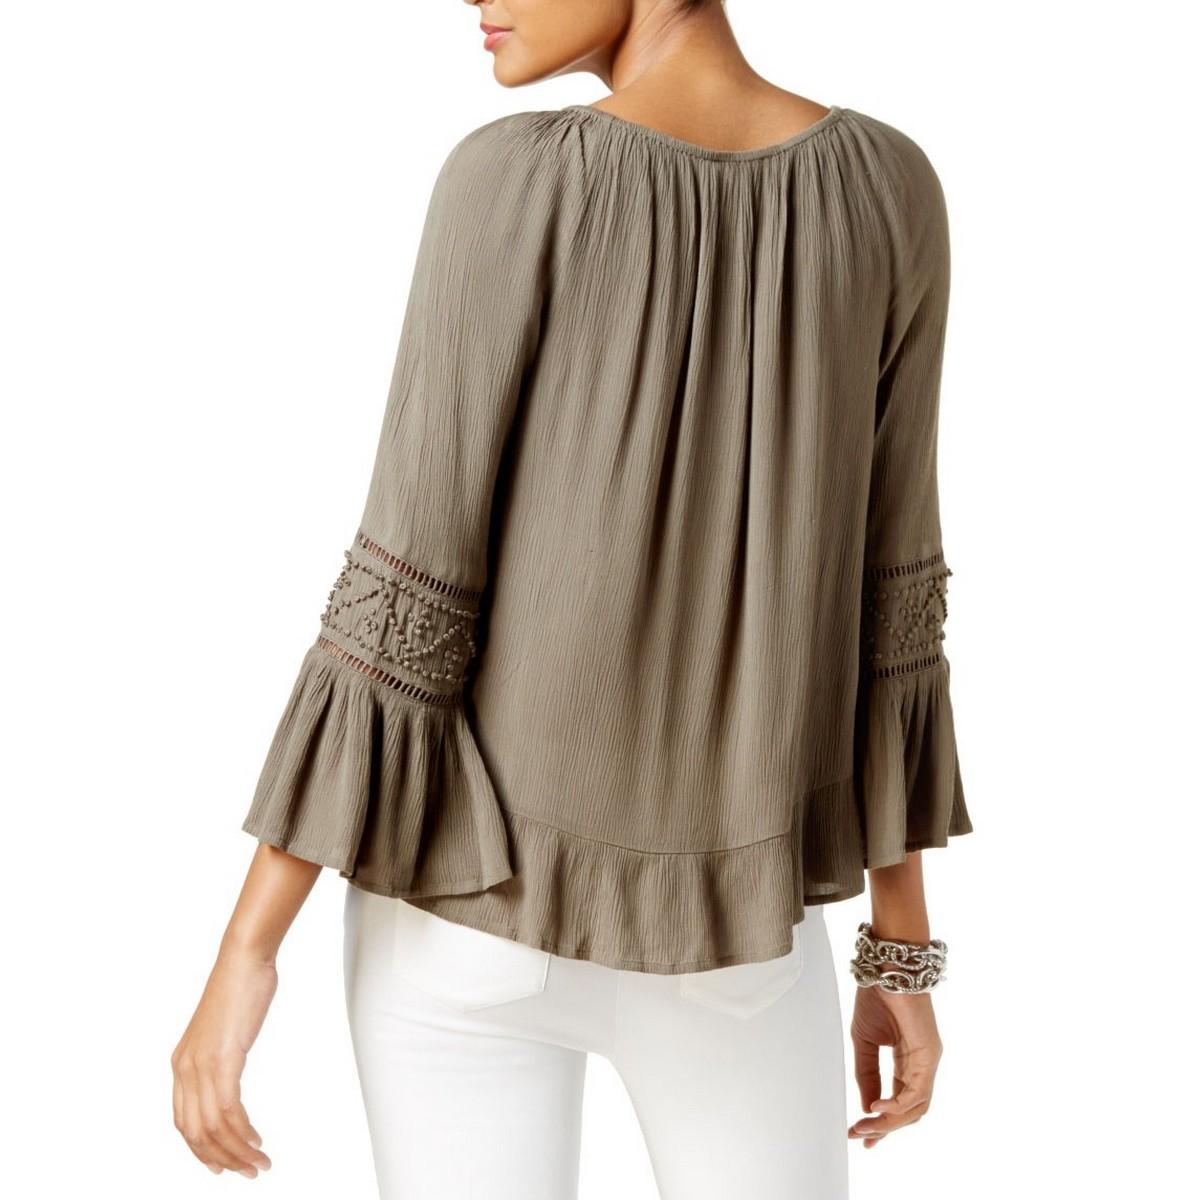 INC-NEW-Women-039-s-Bell-sleeve-Peasant-Crinkled-Blouse-Shirt-Top-TEDO thumbnail 7